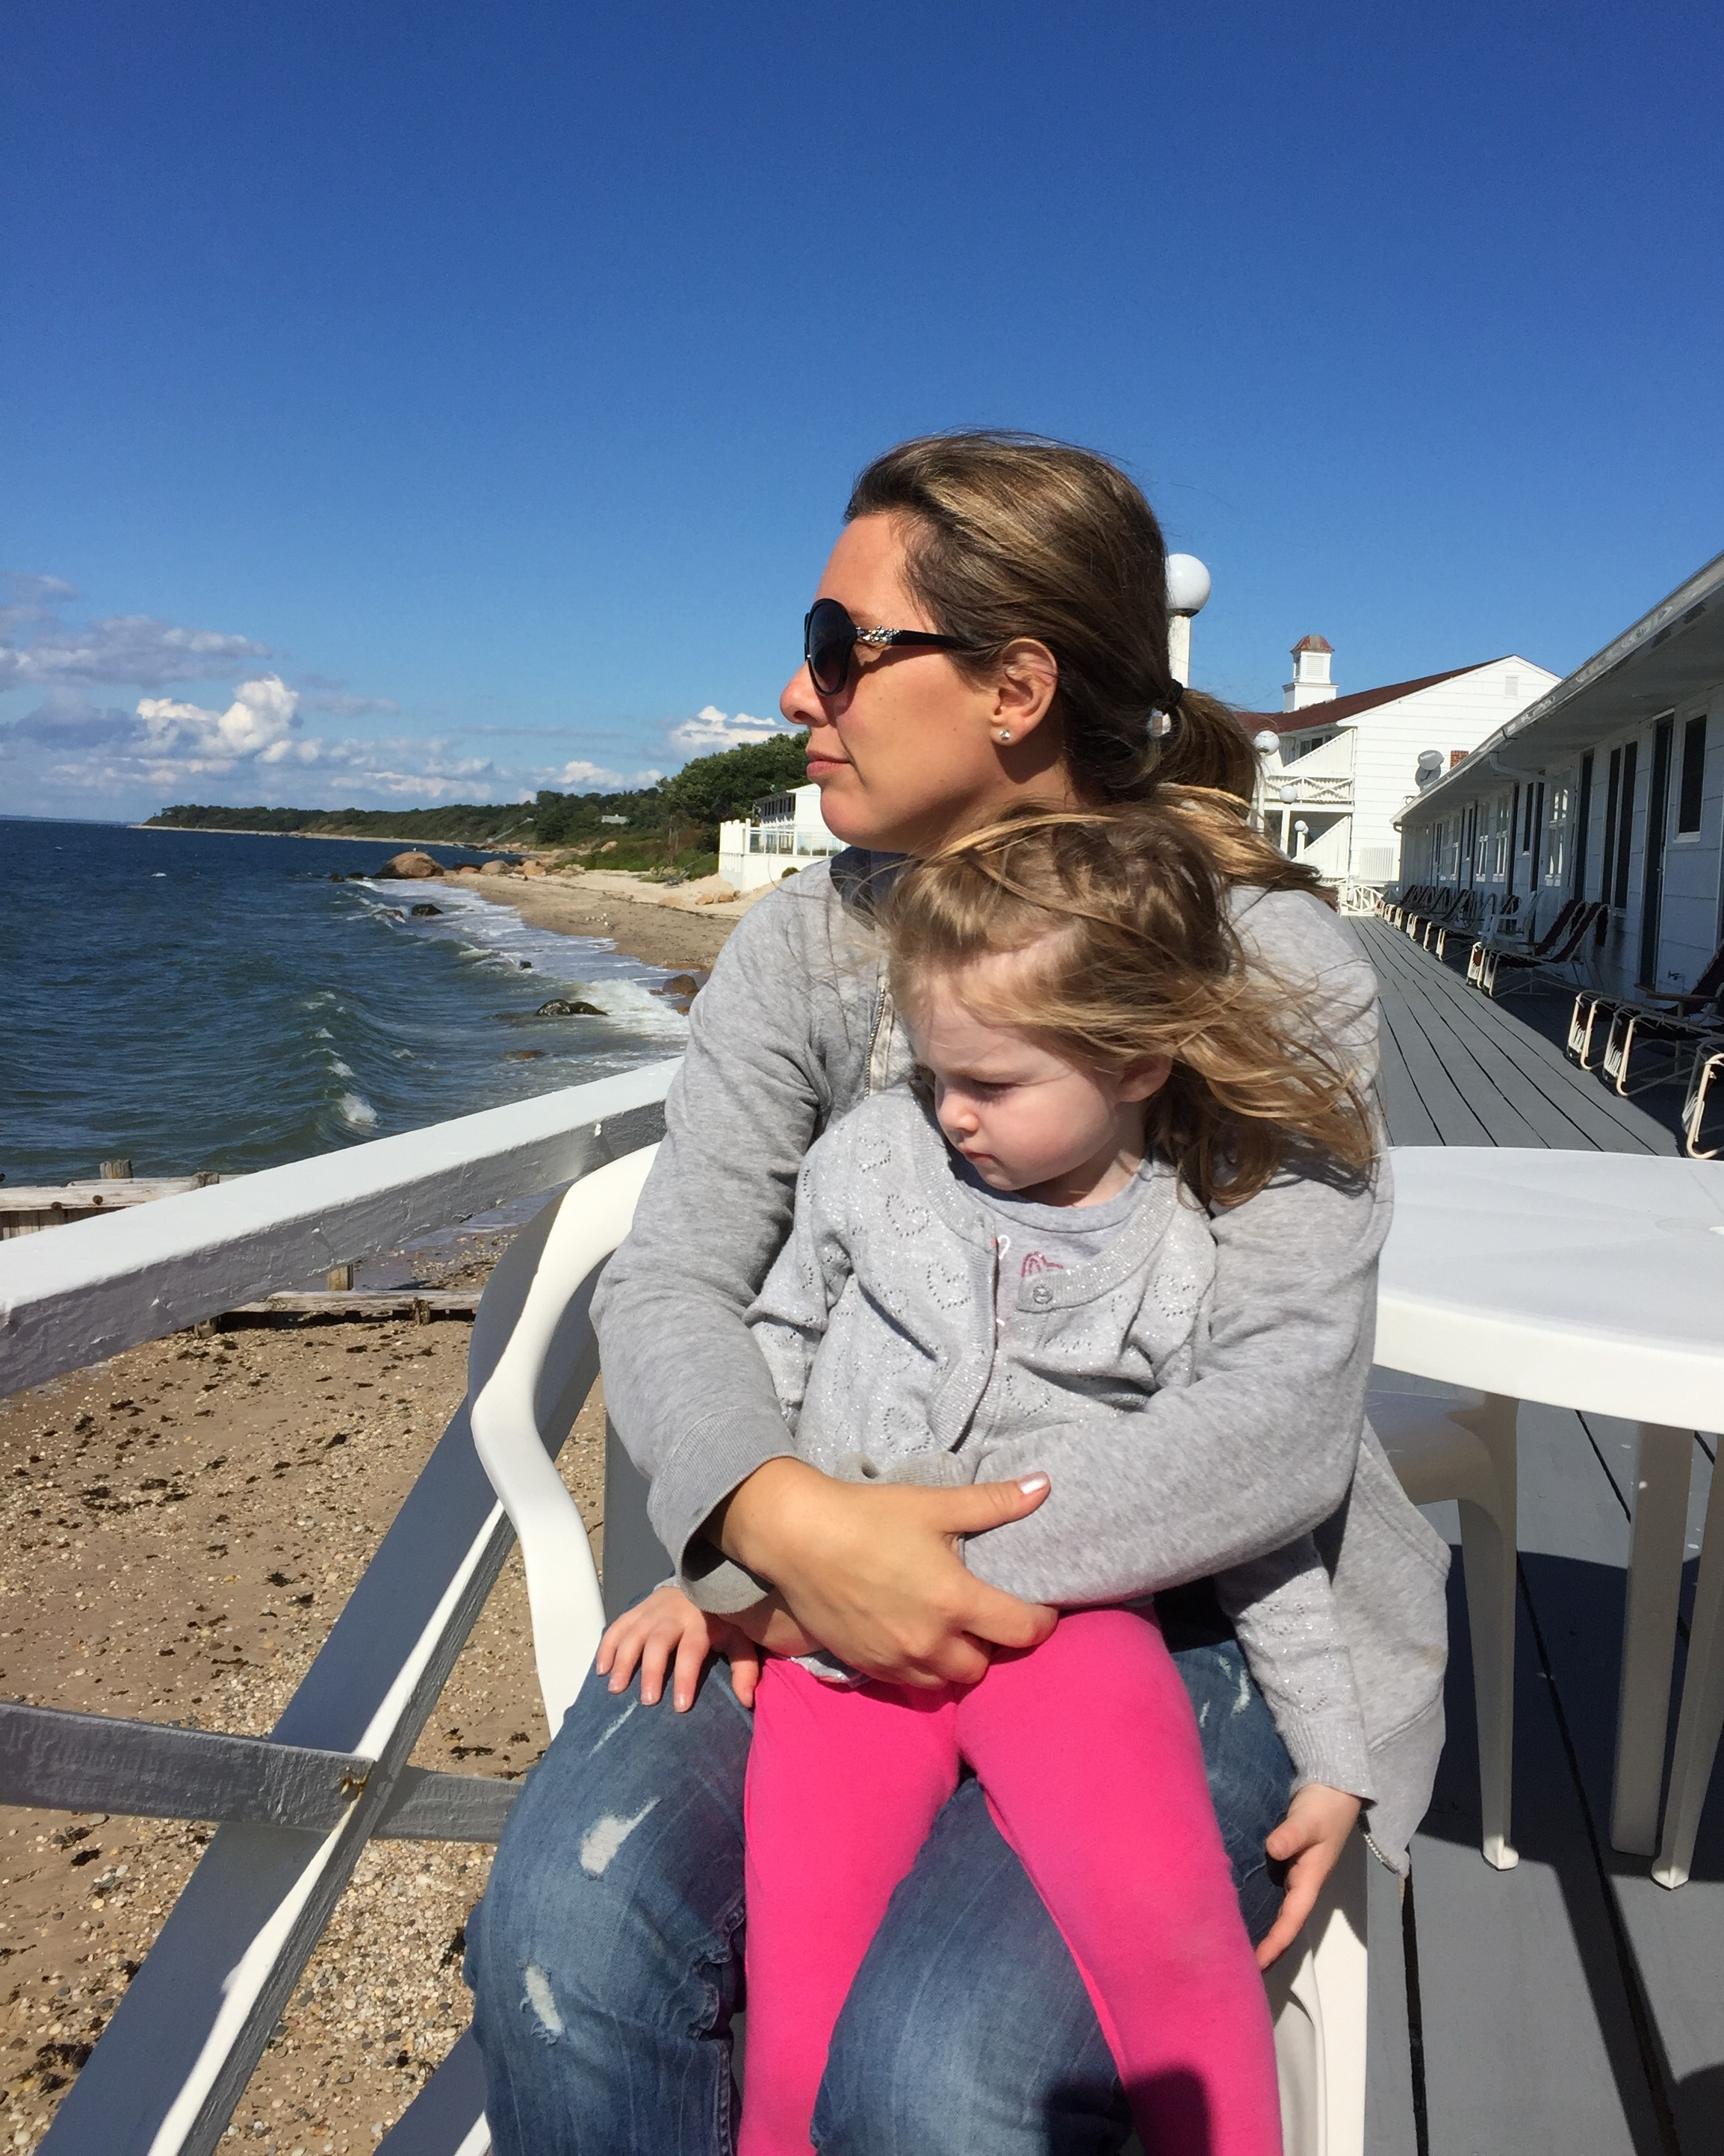 Emmie hopeful mom through adoption